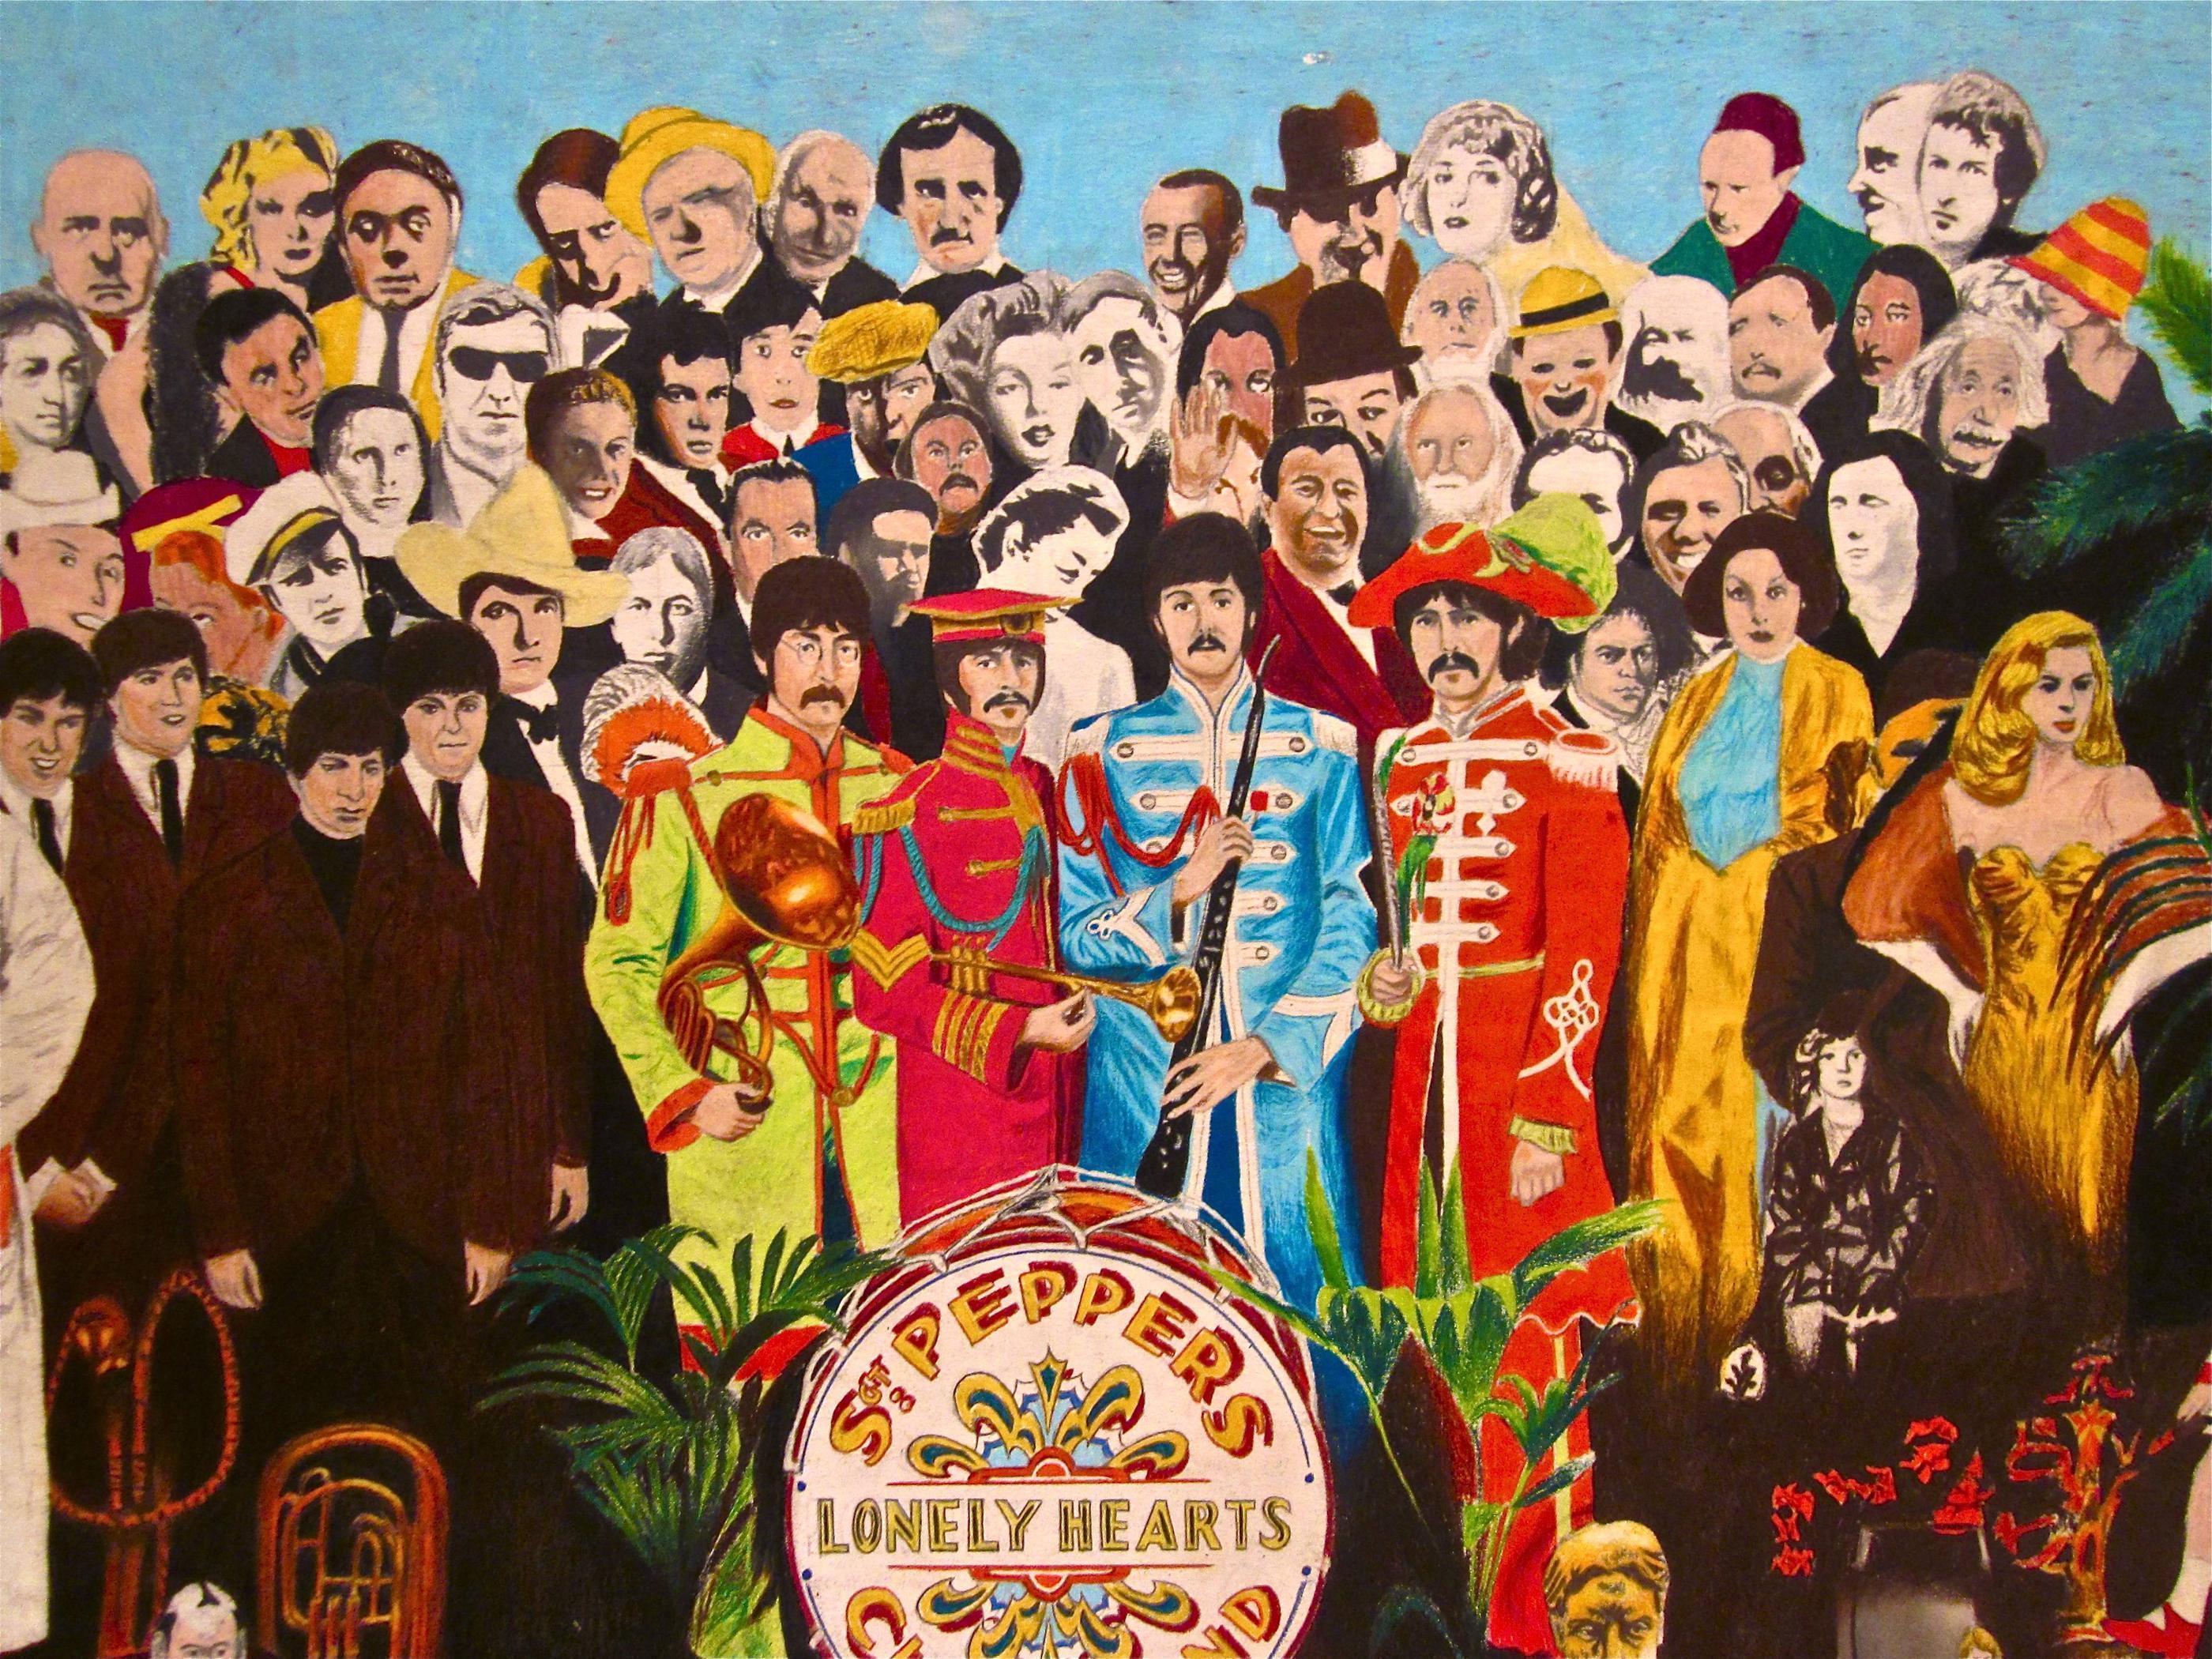 Paul George Wallpaper Hd Sgt Pepper Wallpapers Wallpaper Cave